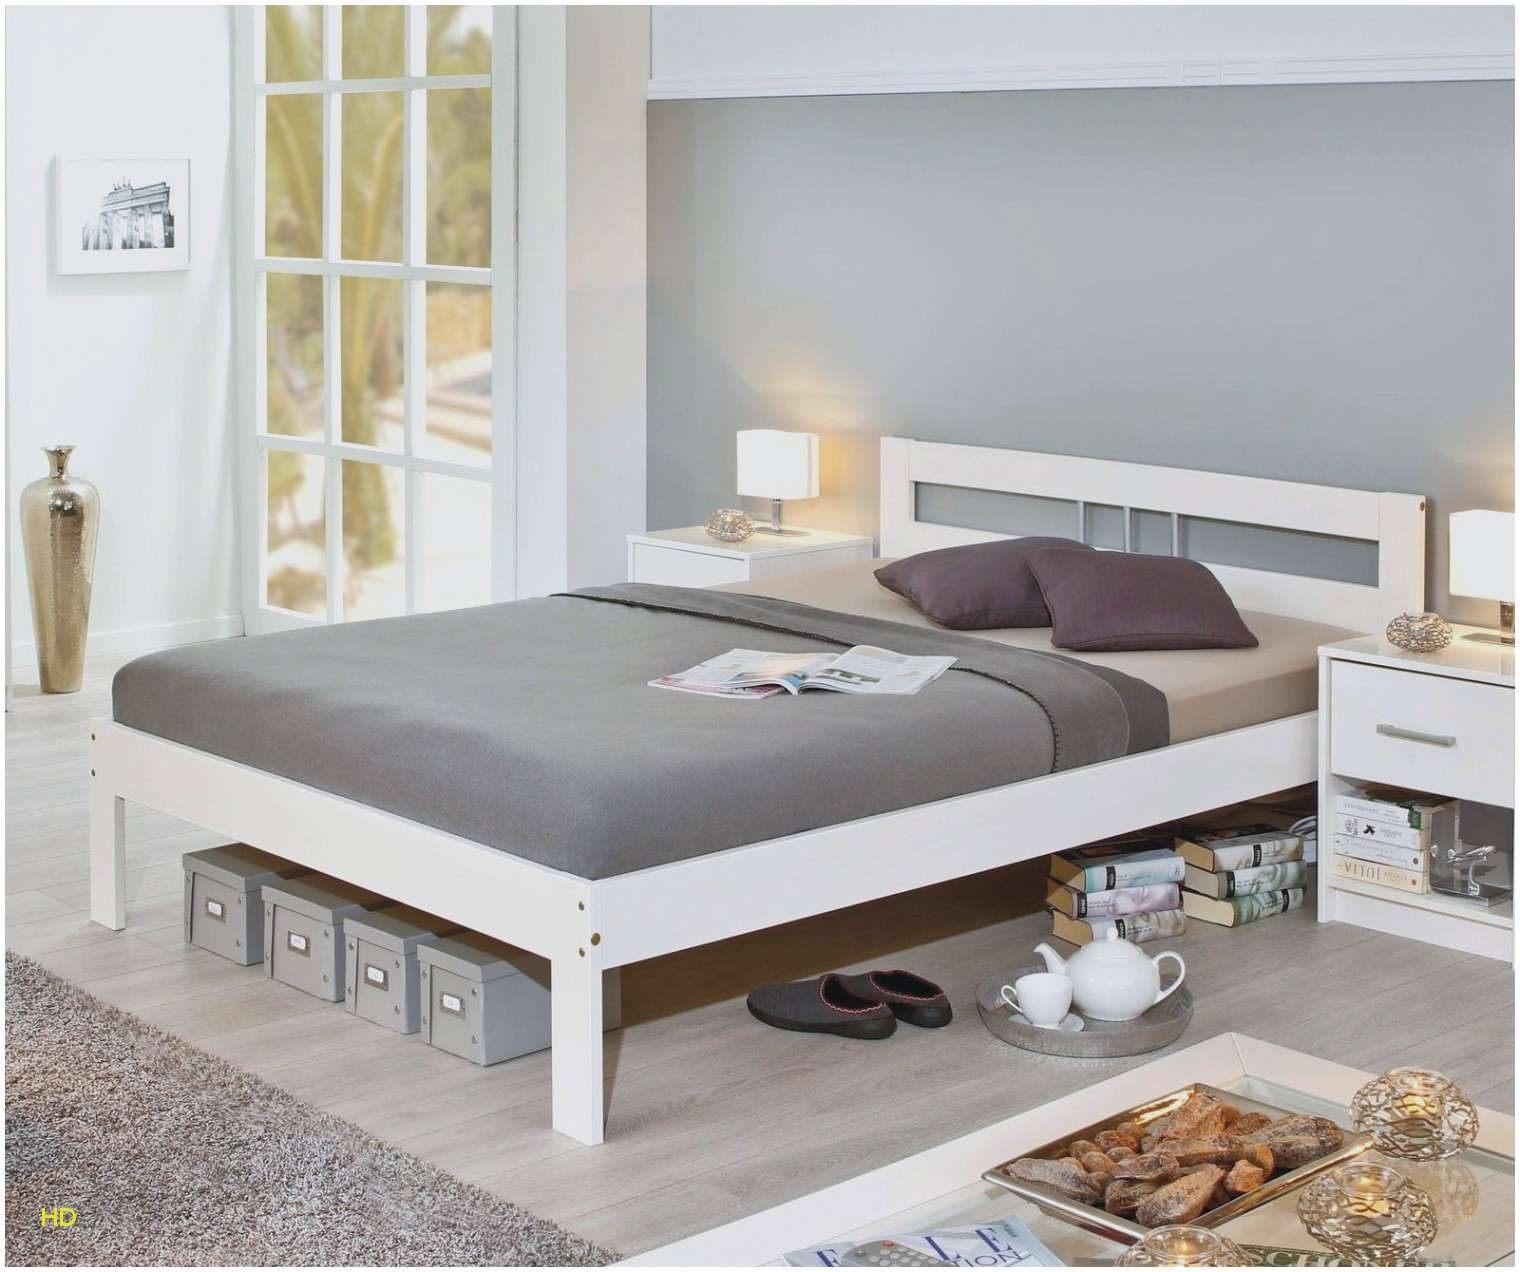 Impressionnant 17 Unique Bett Und Kommode Interior Design Ideas Pour